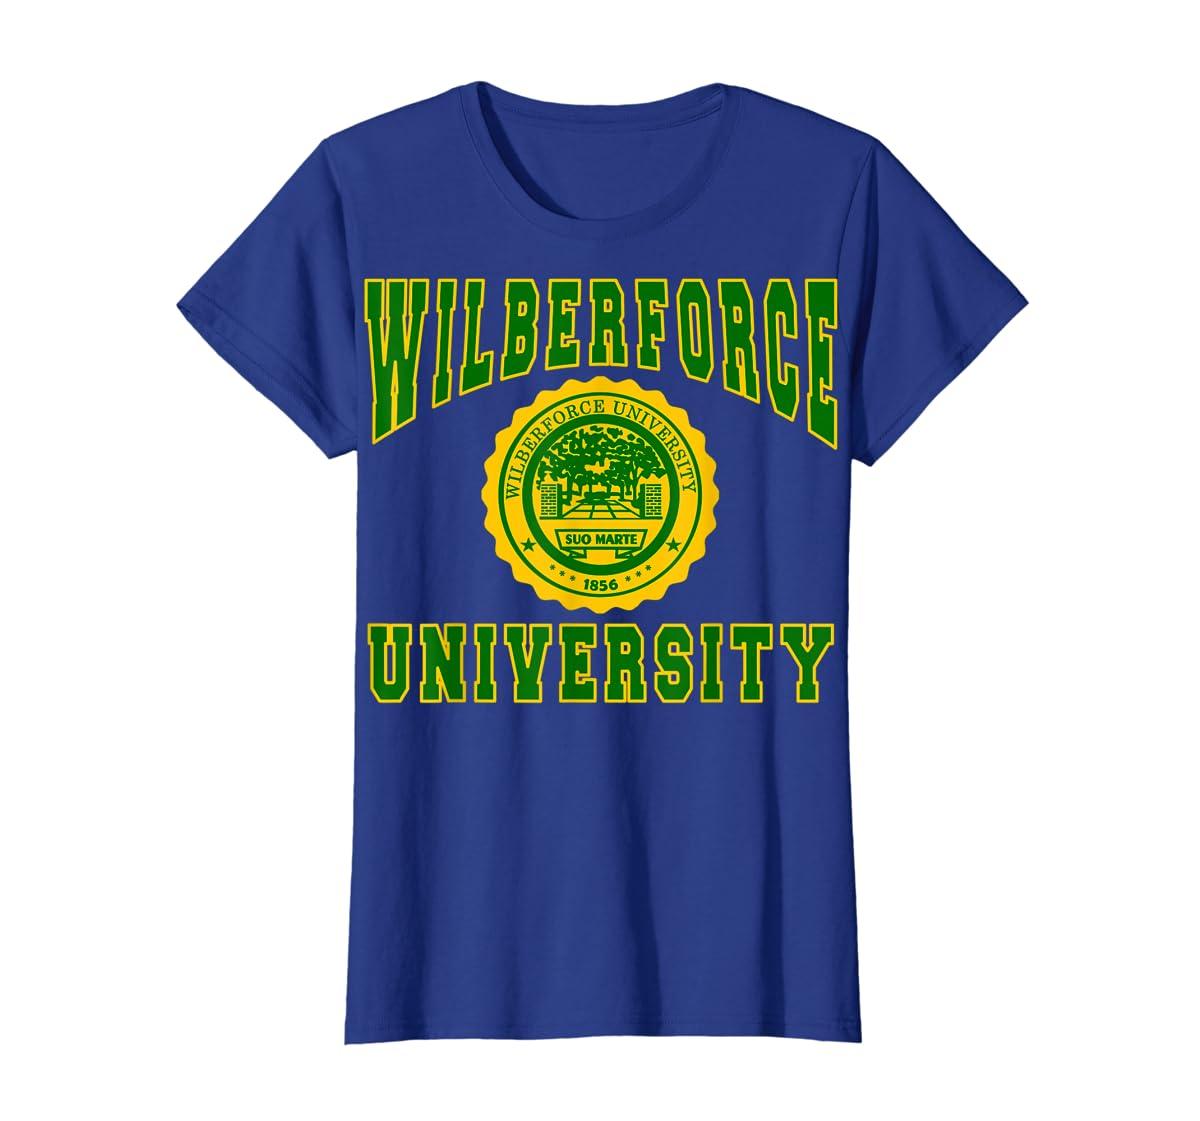 Wilberforce 1856 University Apparel - T shirt-Women's T-Shirt-Royal